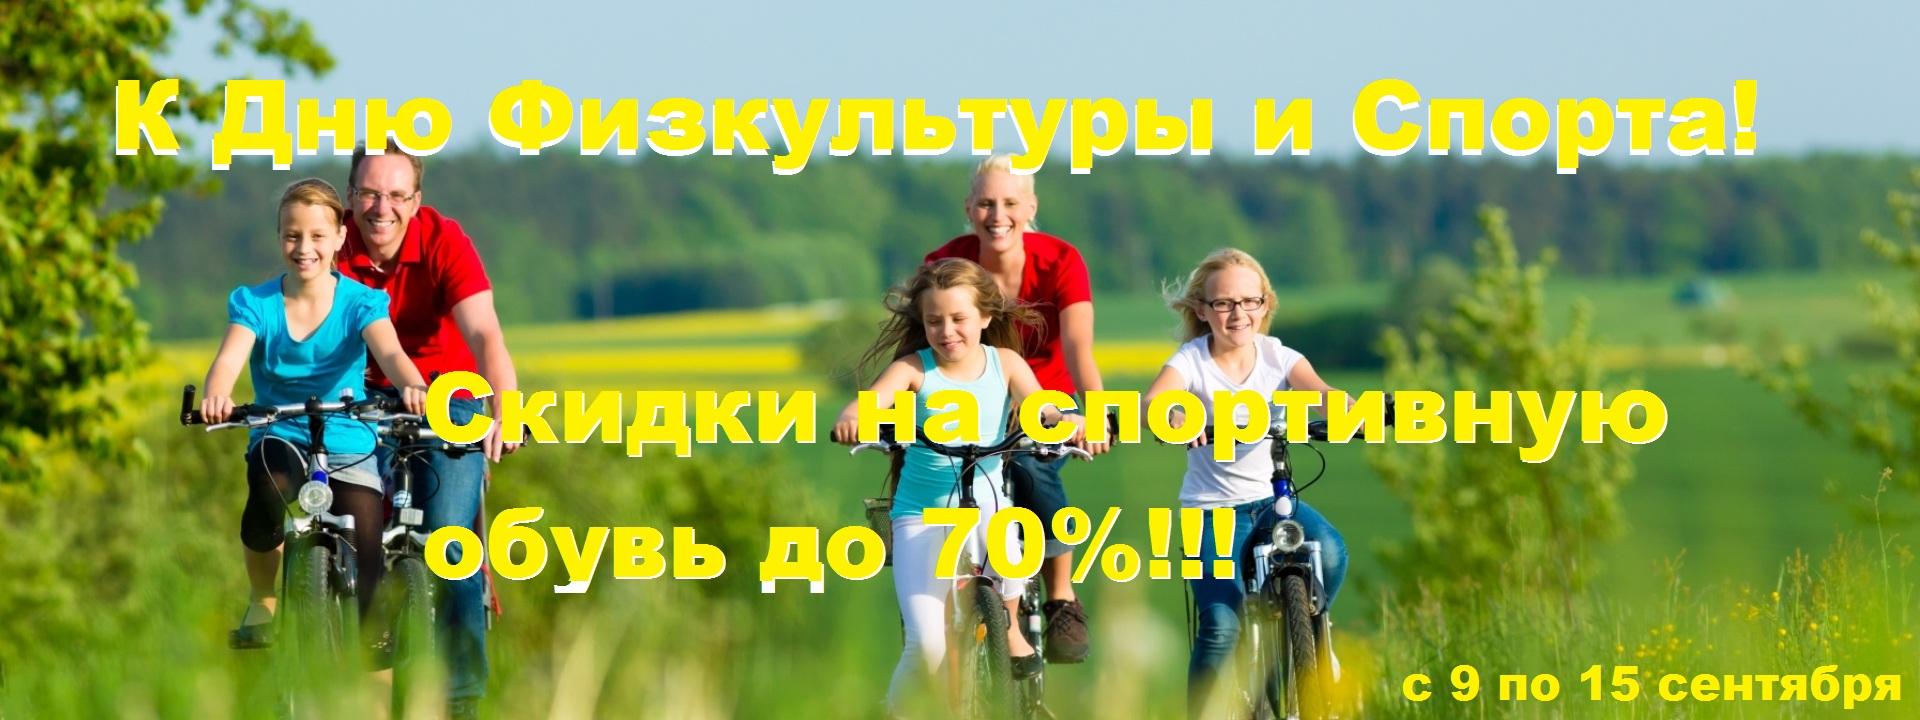 s_dnem_fizkultury_i_sporta